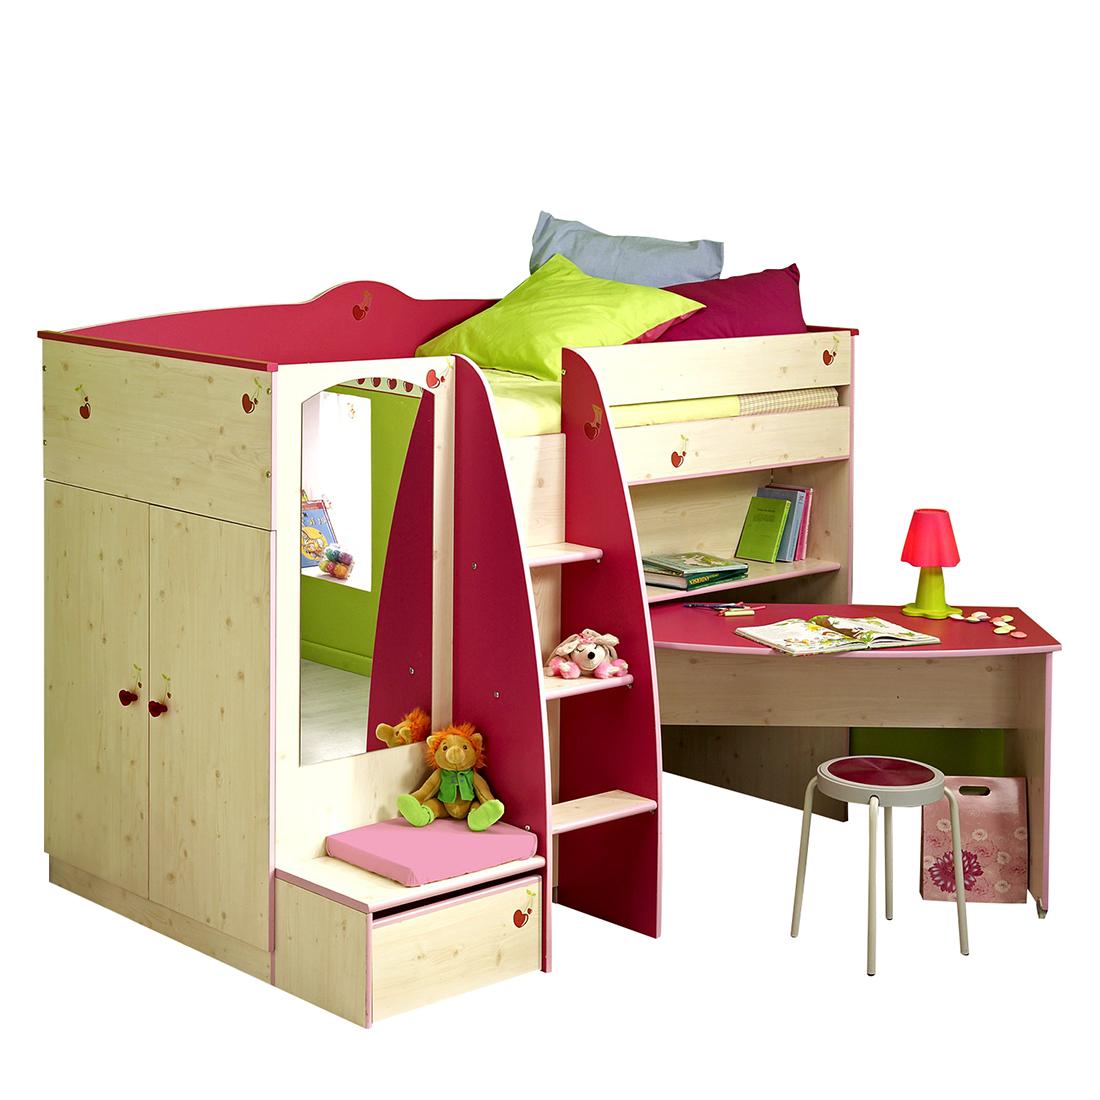 parisot meubles hoogslaper lolita grenenhoutimitatie roze bij woonboulevard xl de mooiste. Black Bedroom Furniture Sets. Home Design Ideas